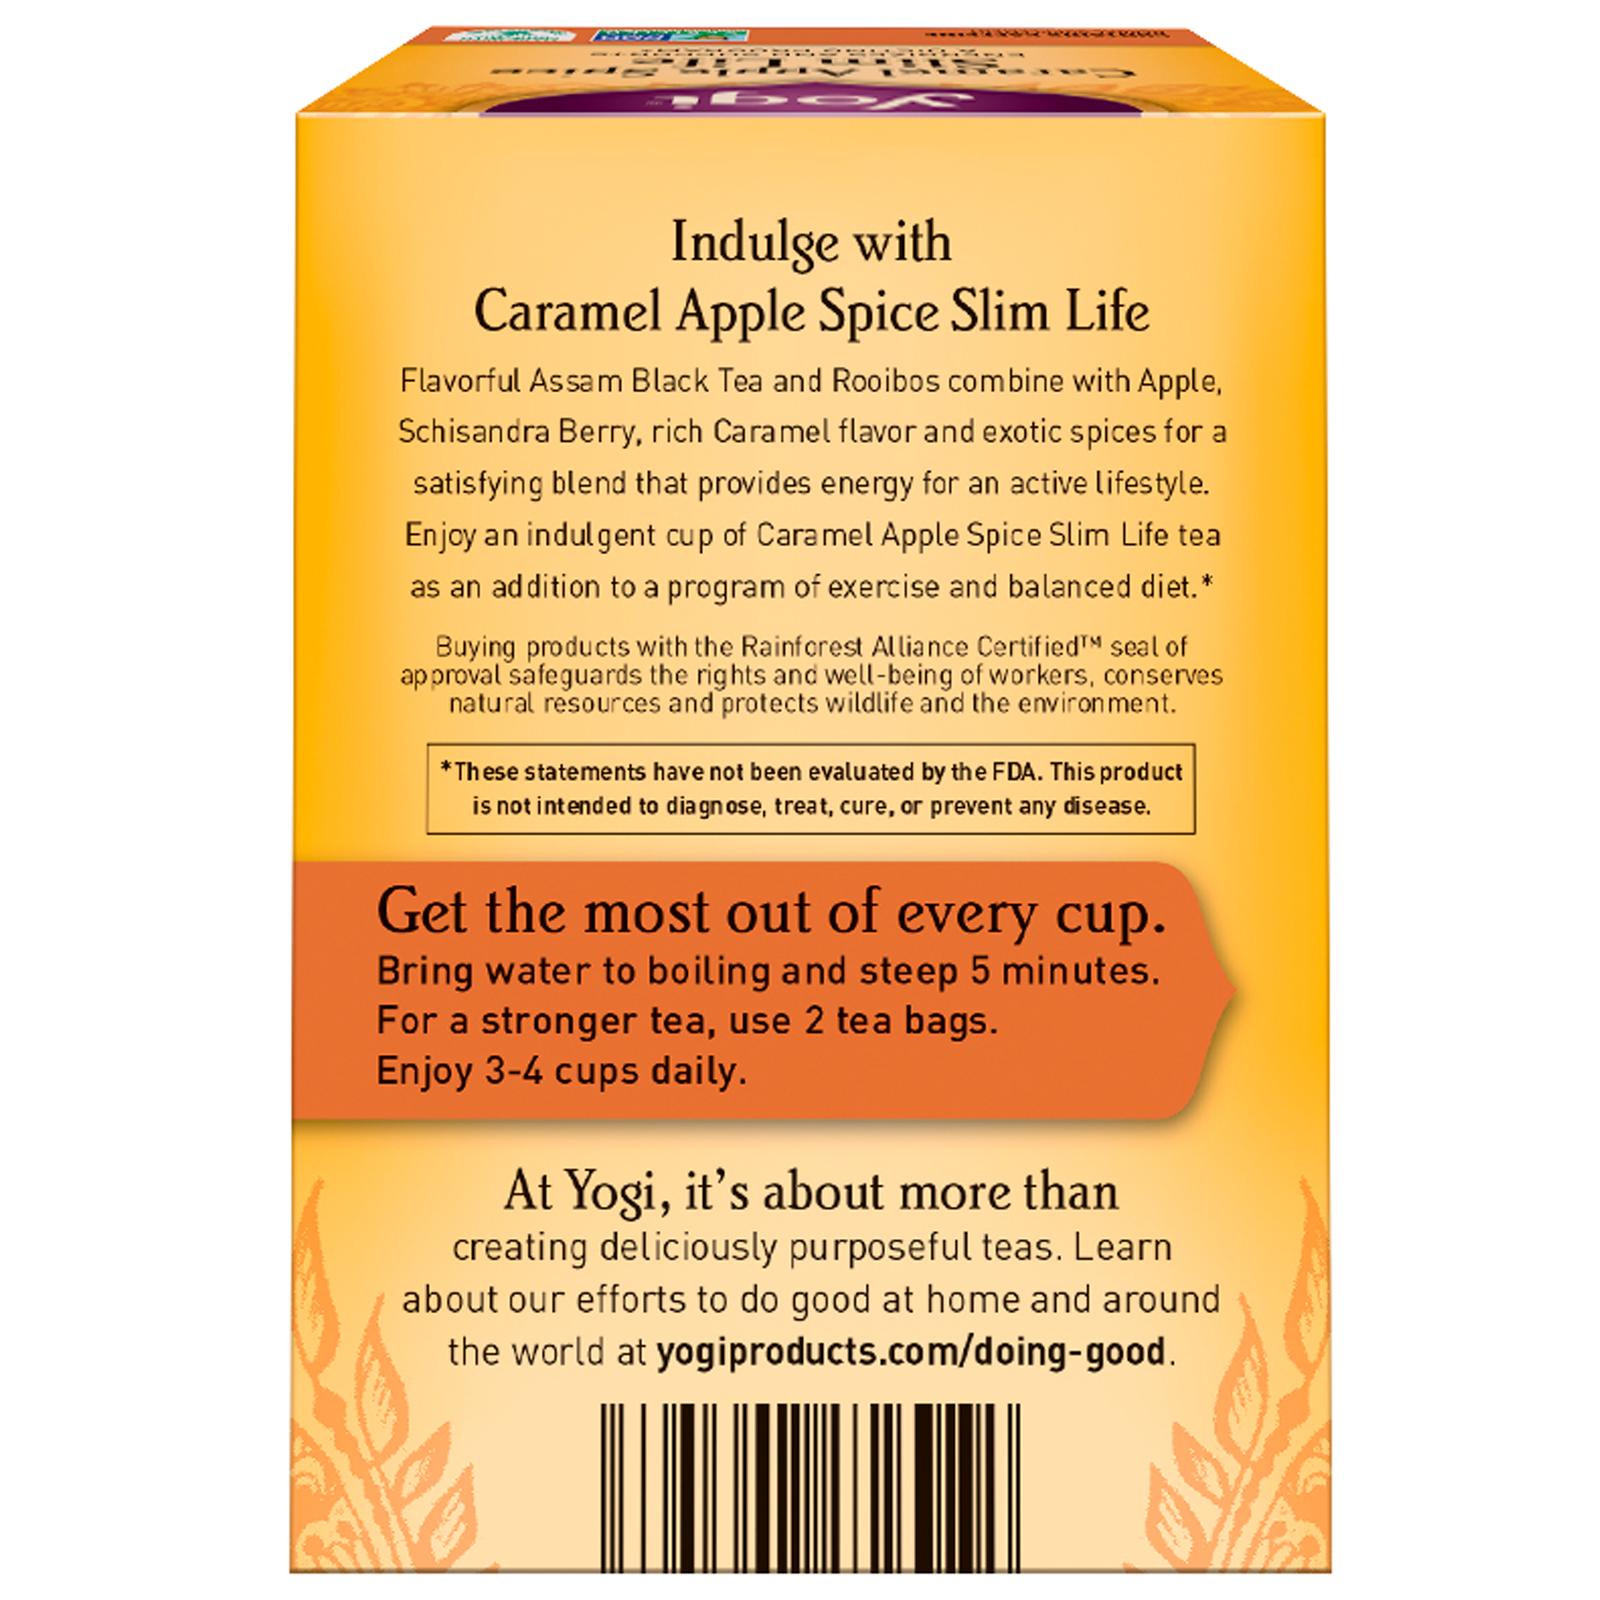 yogi tea slim life caramel apple